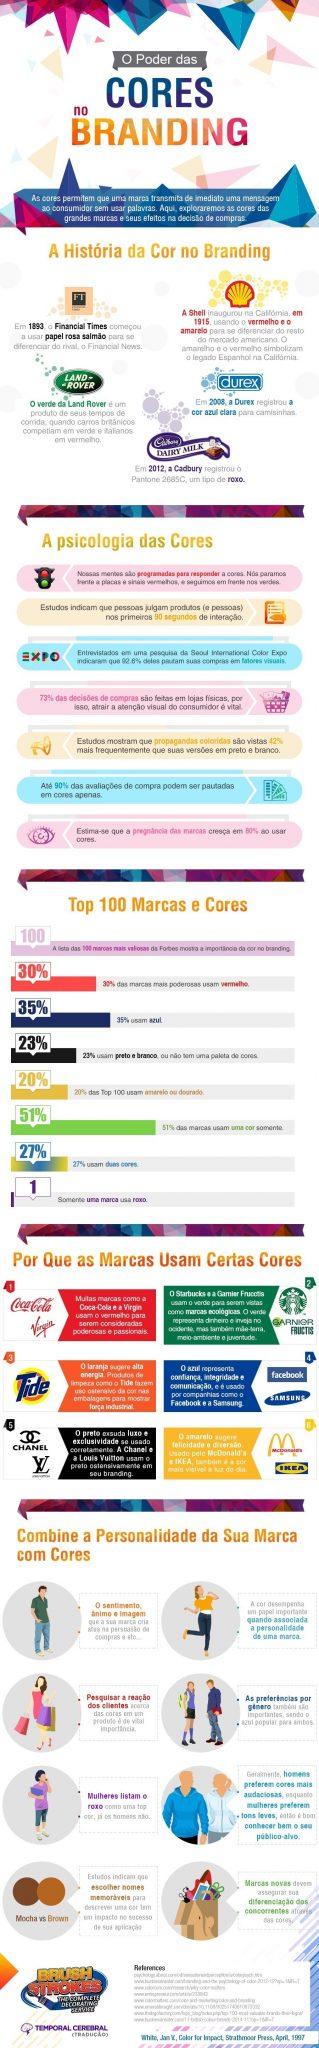 infografico-cores-no-branding